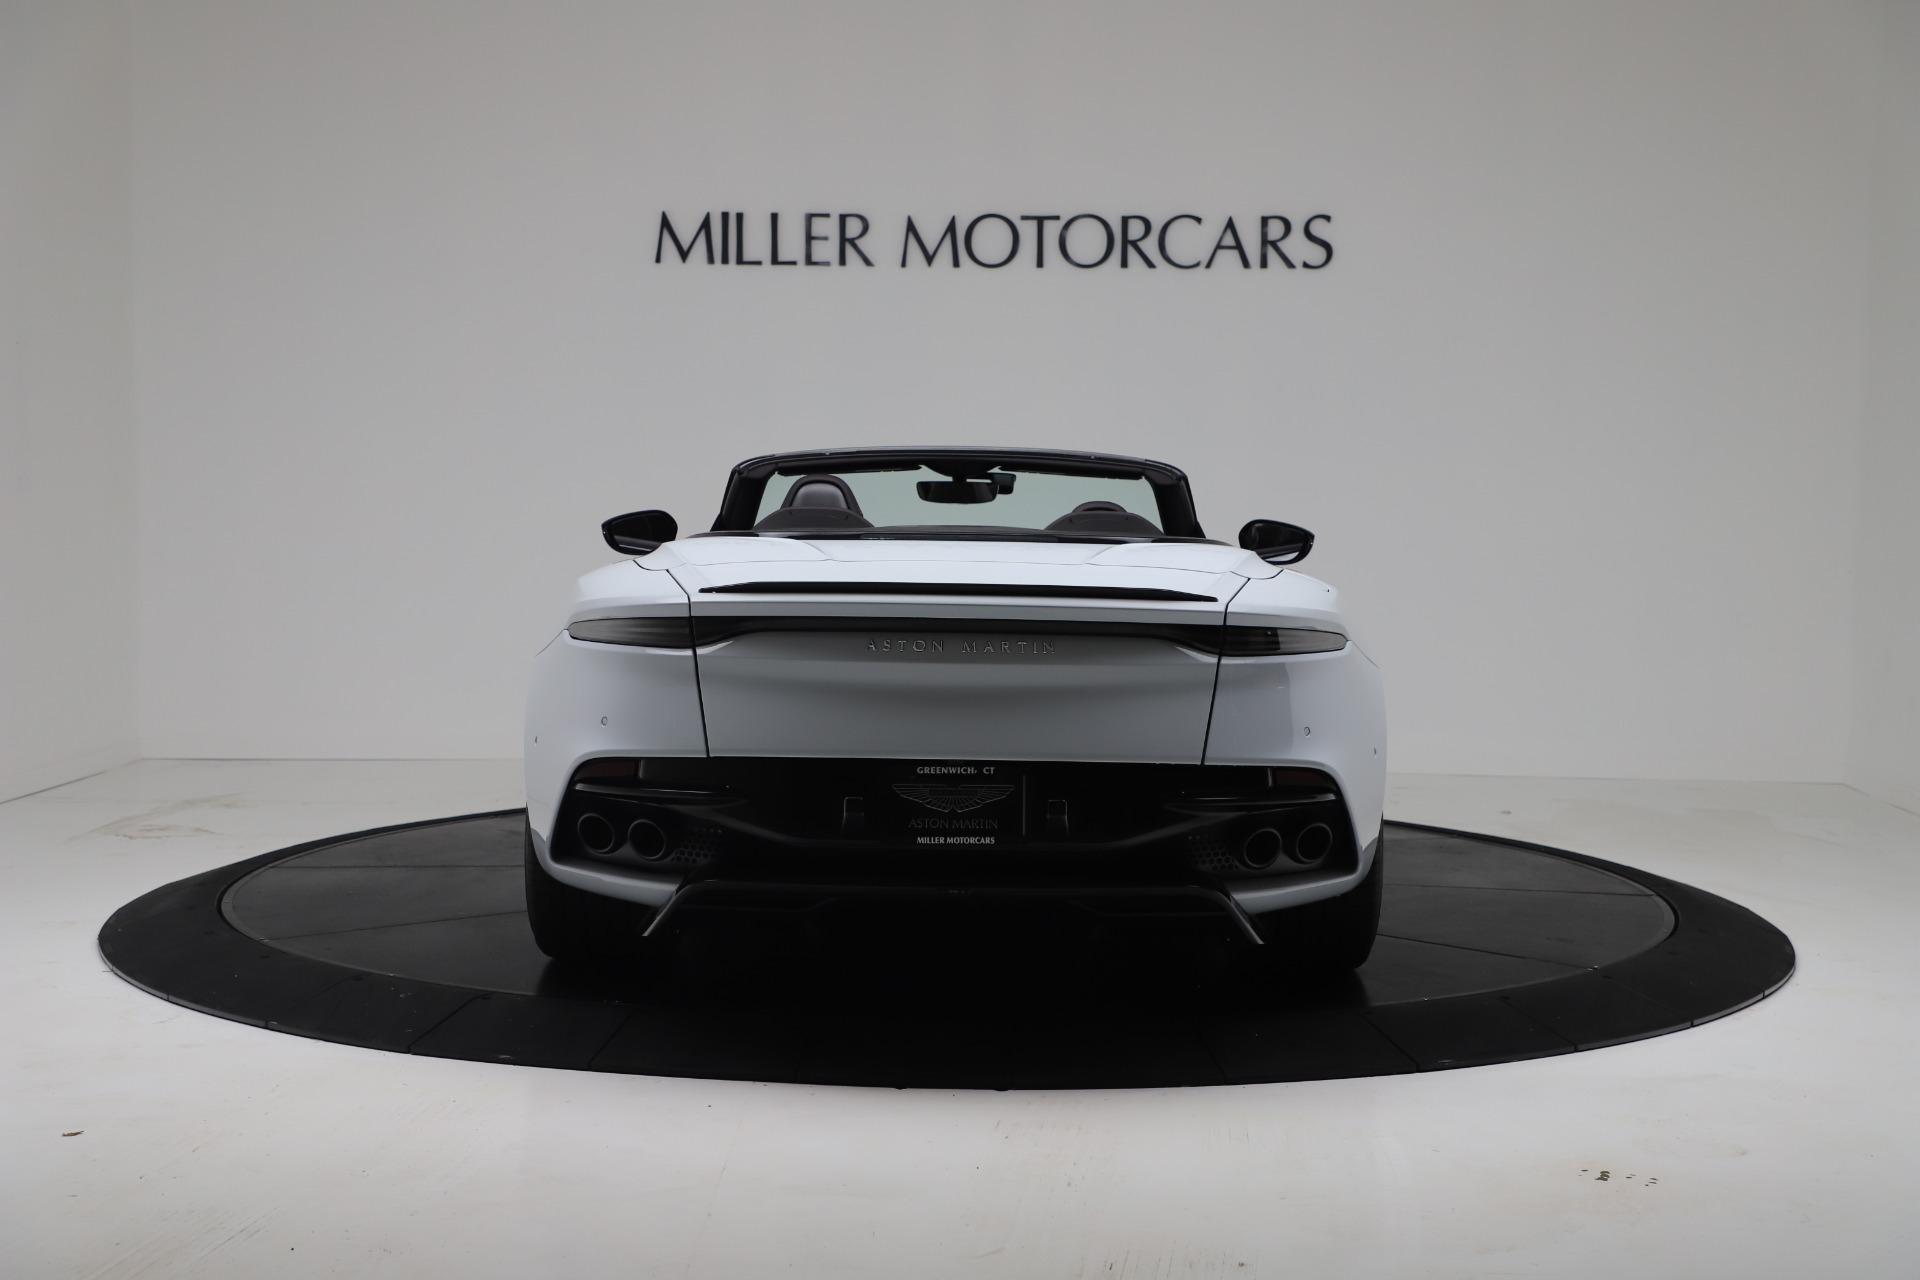 New 2020 Aston Martin DBS Superleggera For Sale In Greenwich, CT 3484_p5